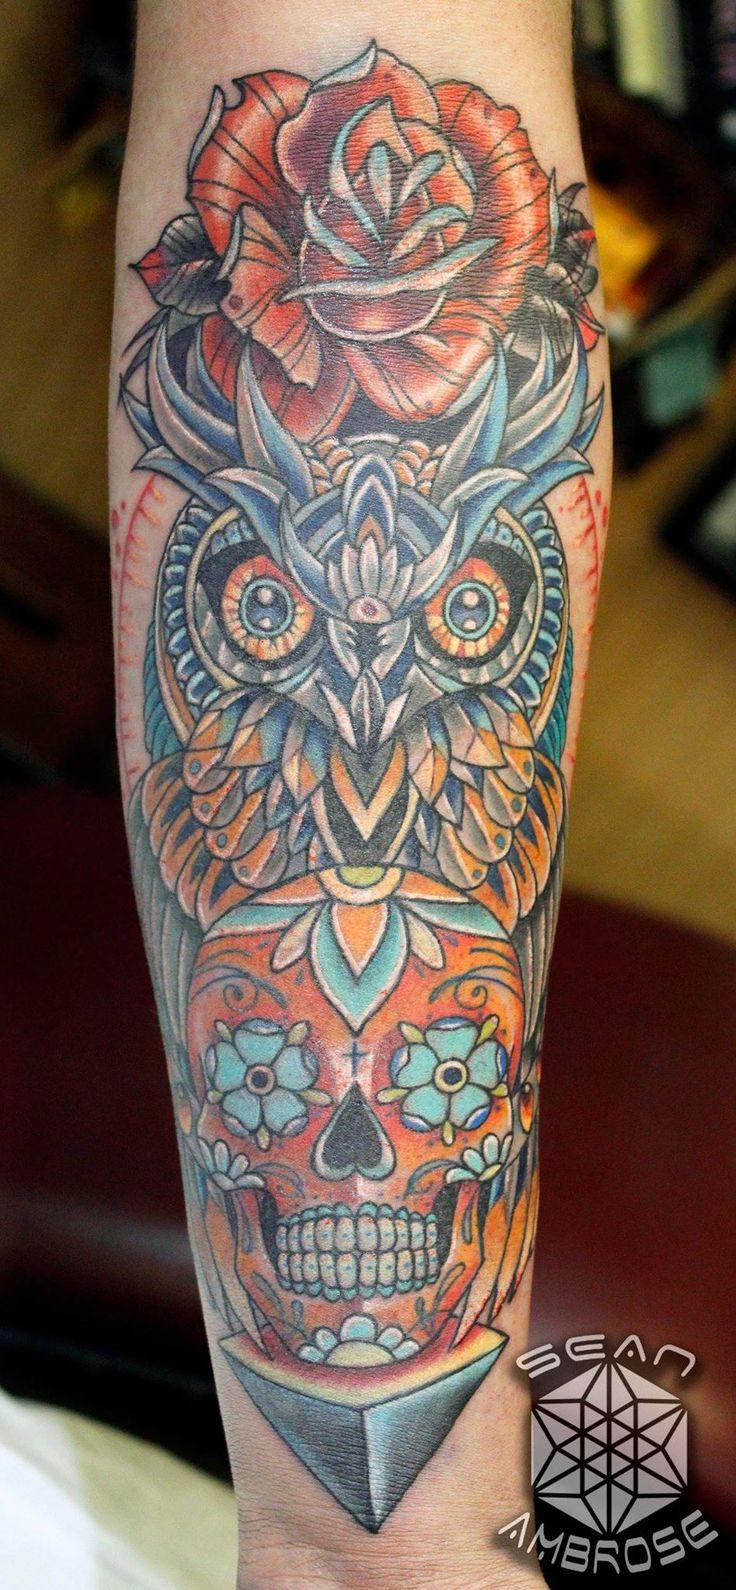 17 best ideas about sugar skull owl on pinterest pretty skull tattoos sugar skull tattoos and. Black Bedroom Furniture Sets. Home Design Ideas